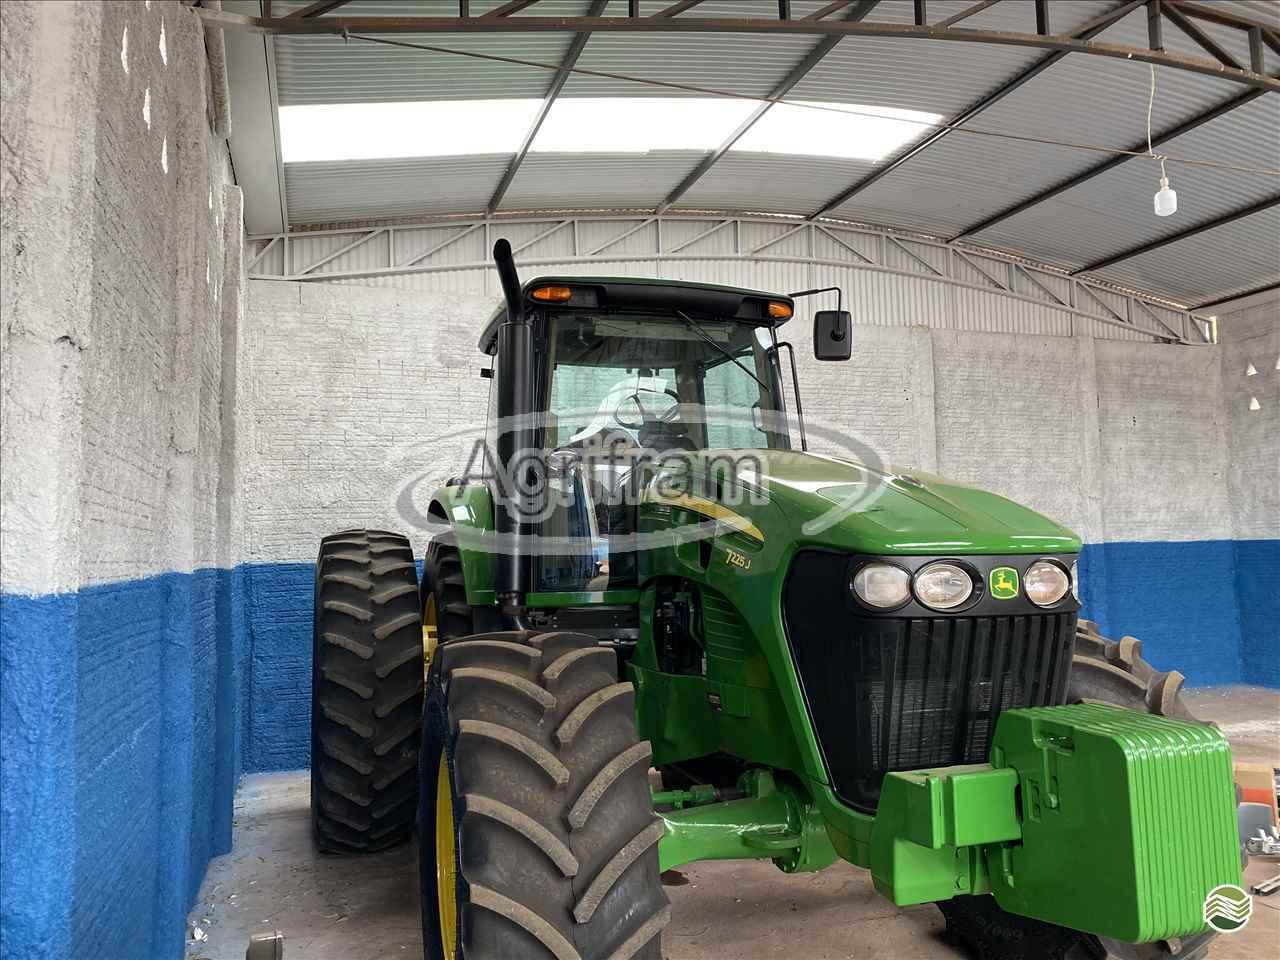 JOHN DEERE JOHN DEERE 7225  2013/2013 Agrifram Máquinas e Soluções Agrícolas